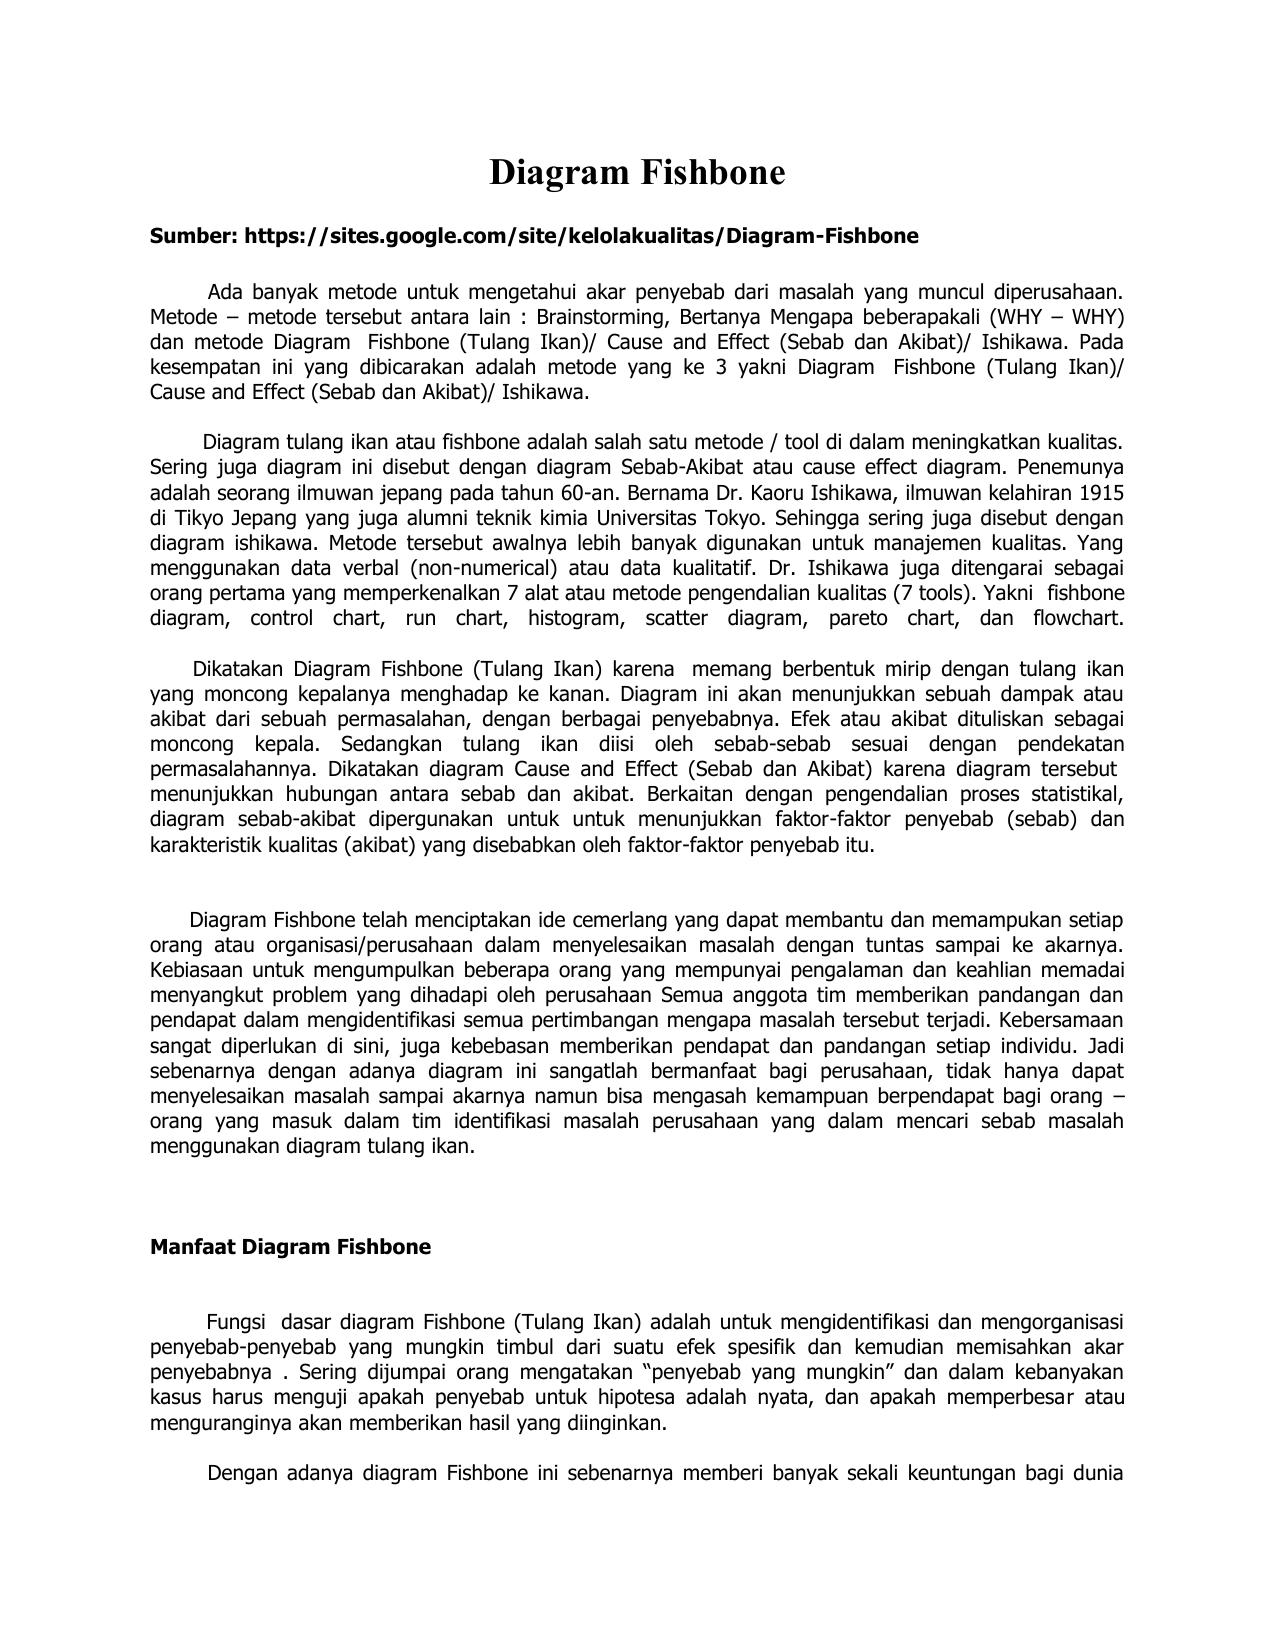 Diagram fishbone situs blog staff pengajar universitas budi luhur ccuart Choice Image